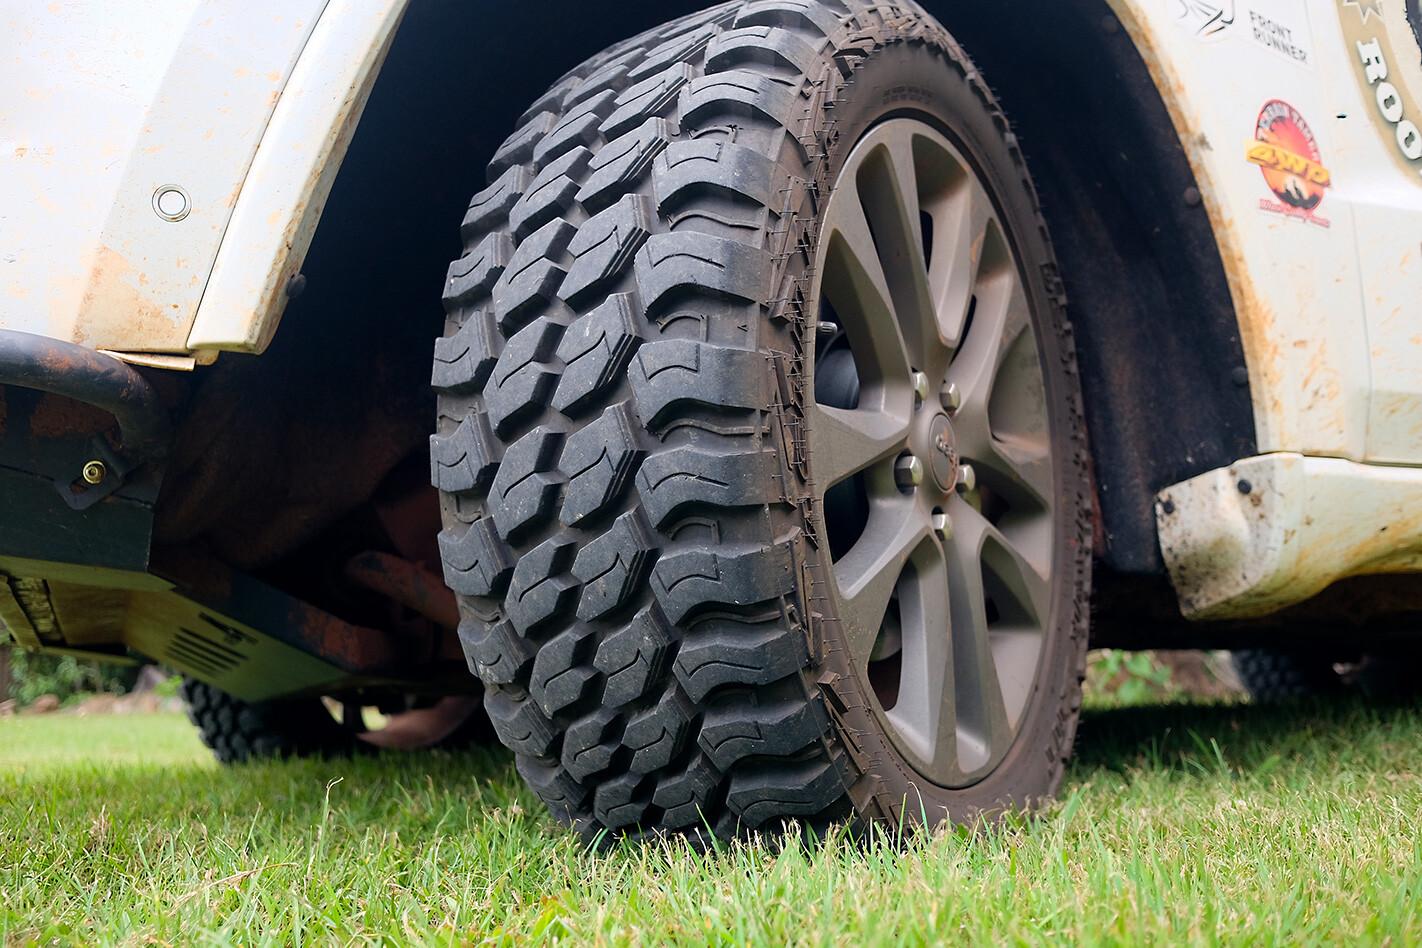 2017 Jeep Grand Cherokee wheels